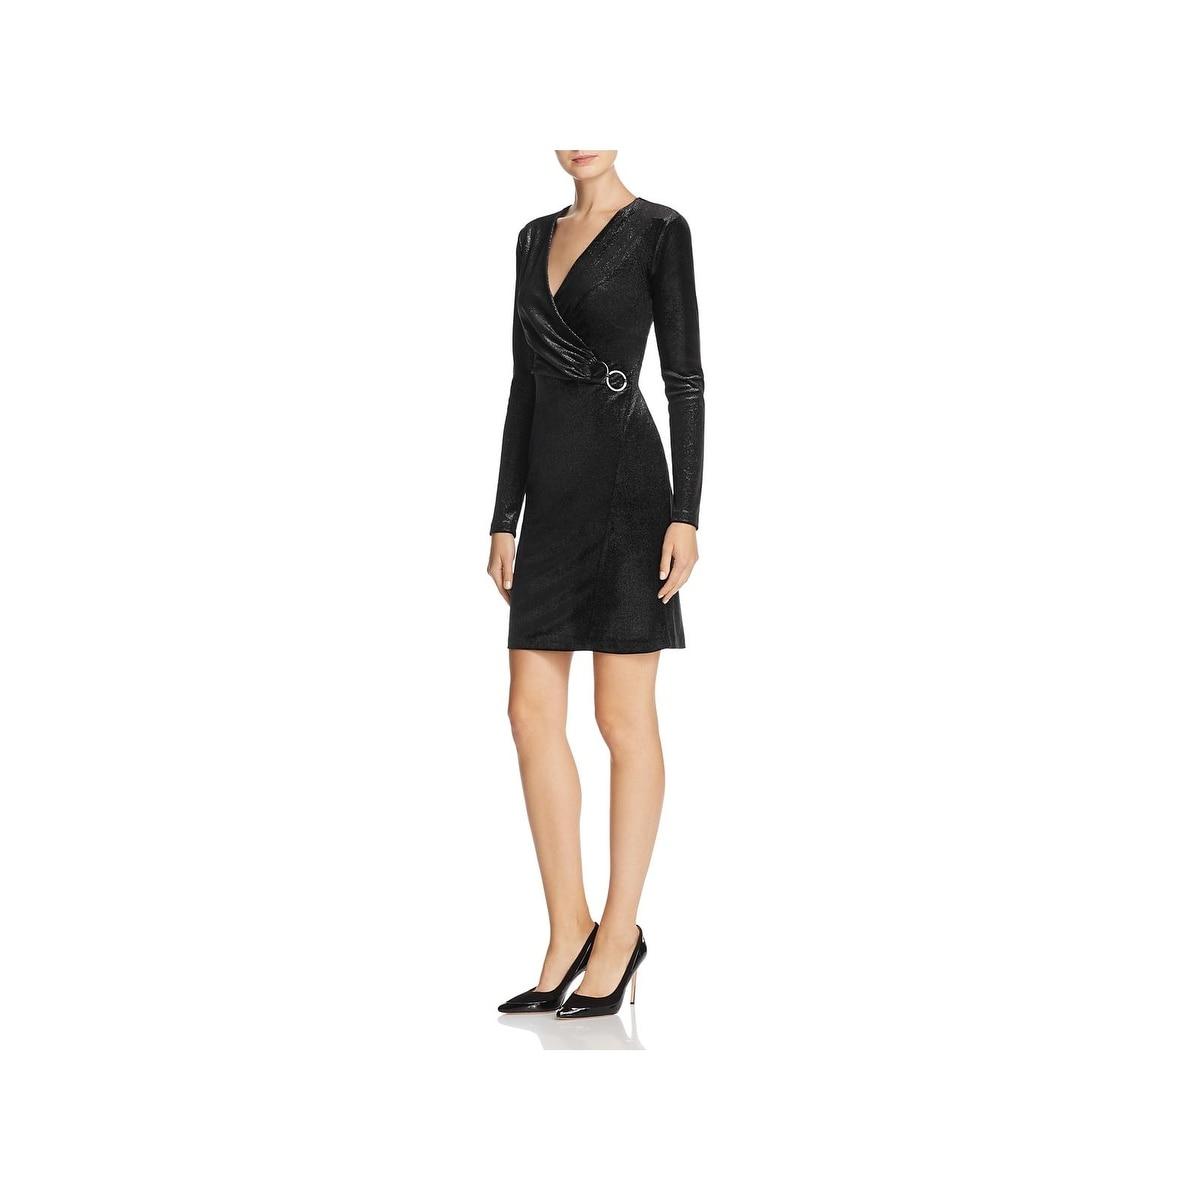 372ac1cd8e0d9 Shop T Tahari Womens Maureen Cocktail Dress Metallic Faux Wrap - On ...